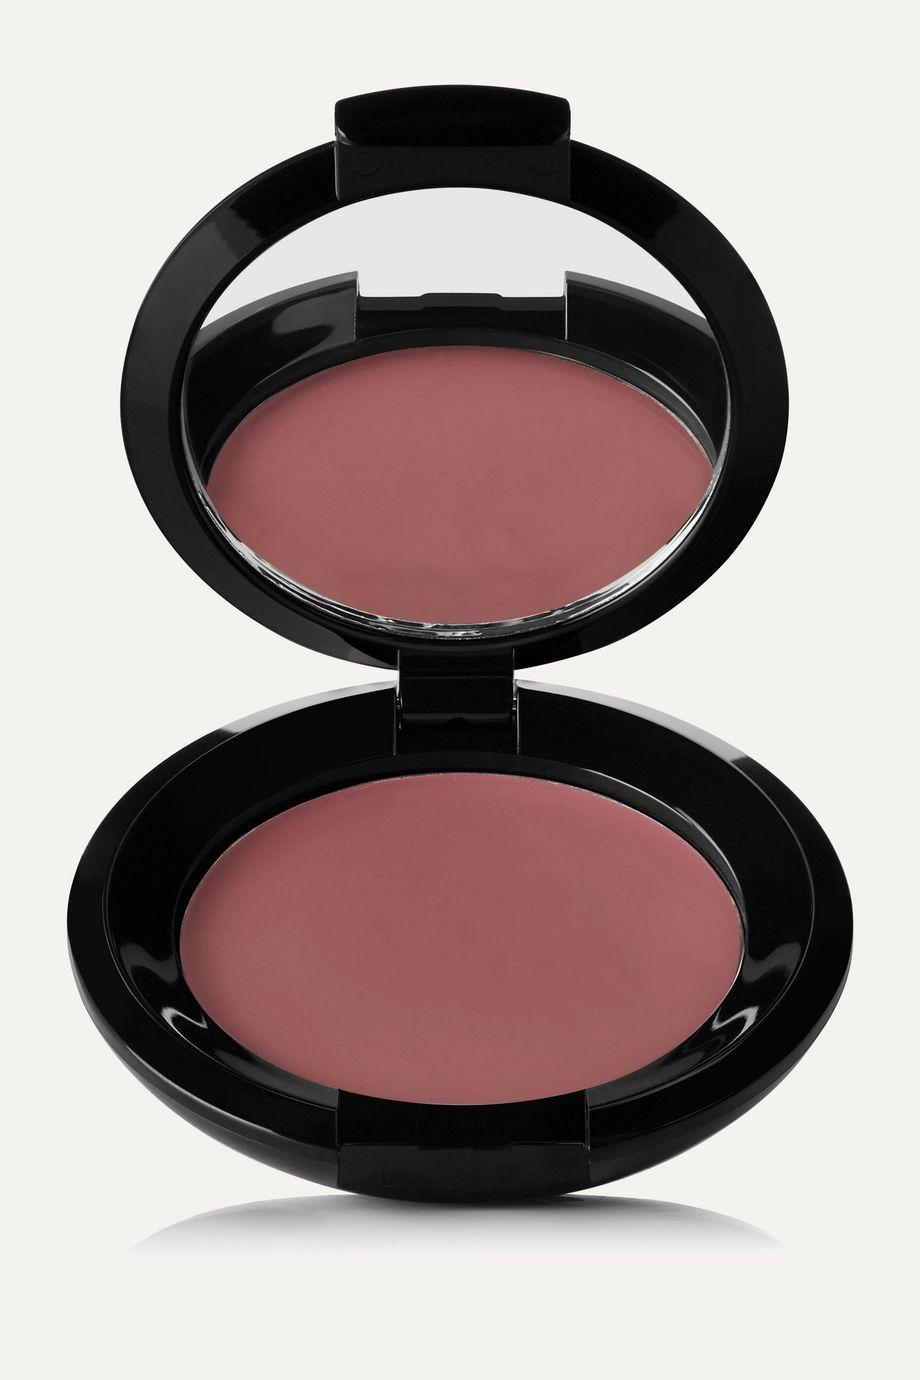 Rituel de Fille Inner Glow Crème Pigment - Lovesick